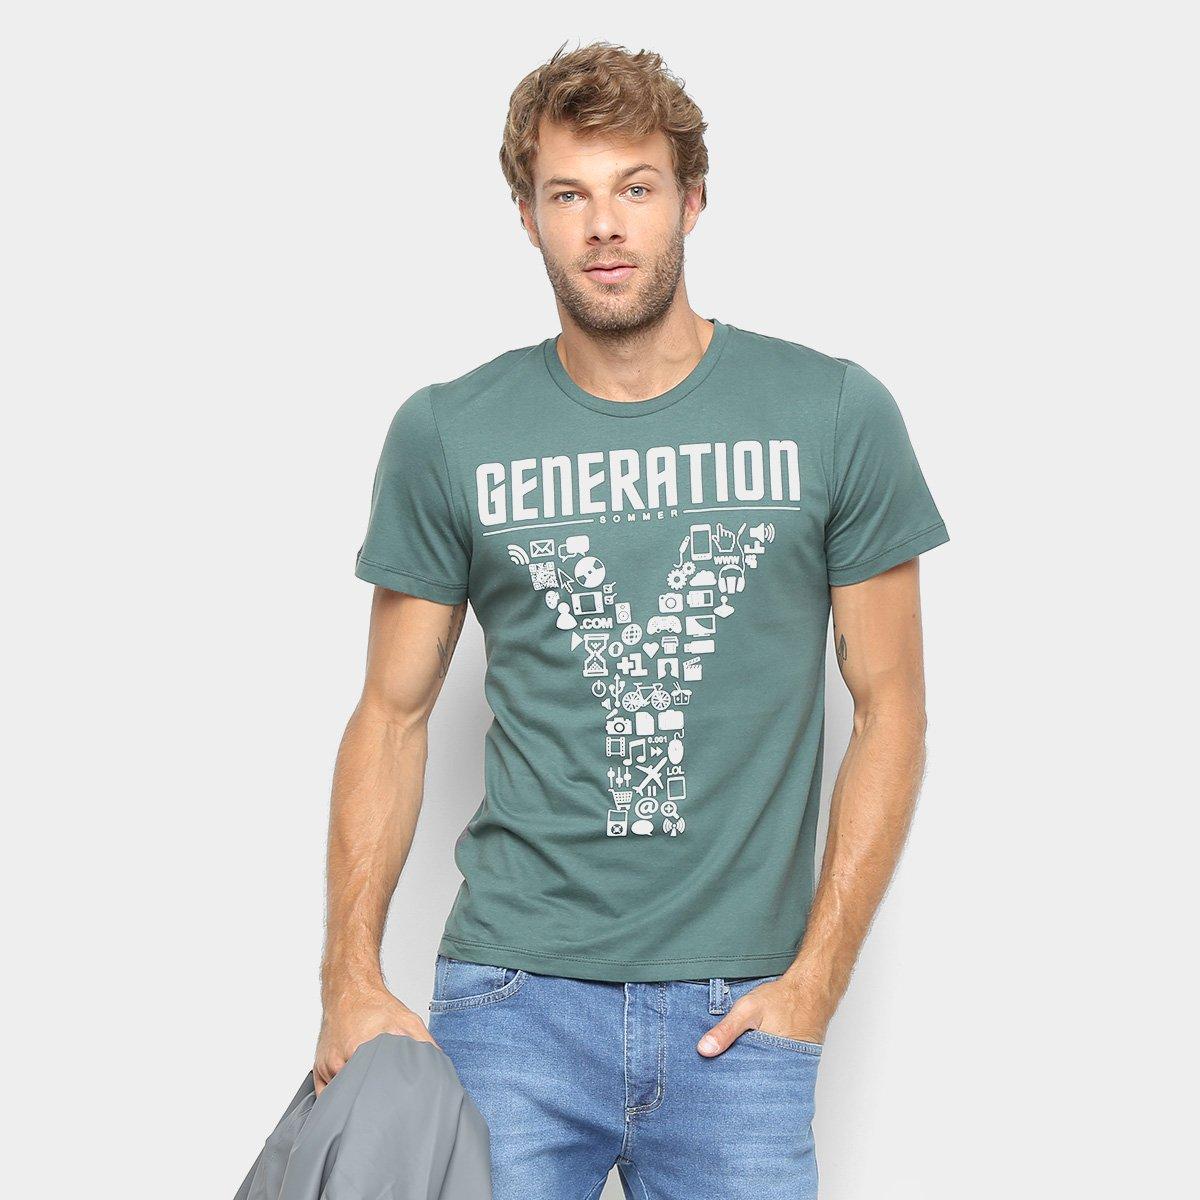 Nixon Asas Camiseta Manga Curta Camiseta X-grande Roxo//Preto gg